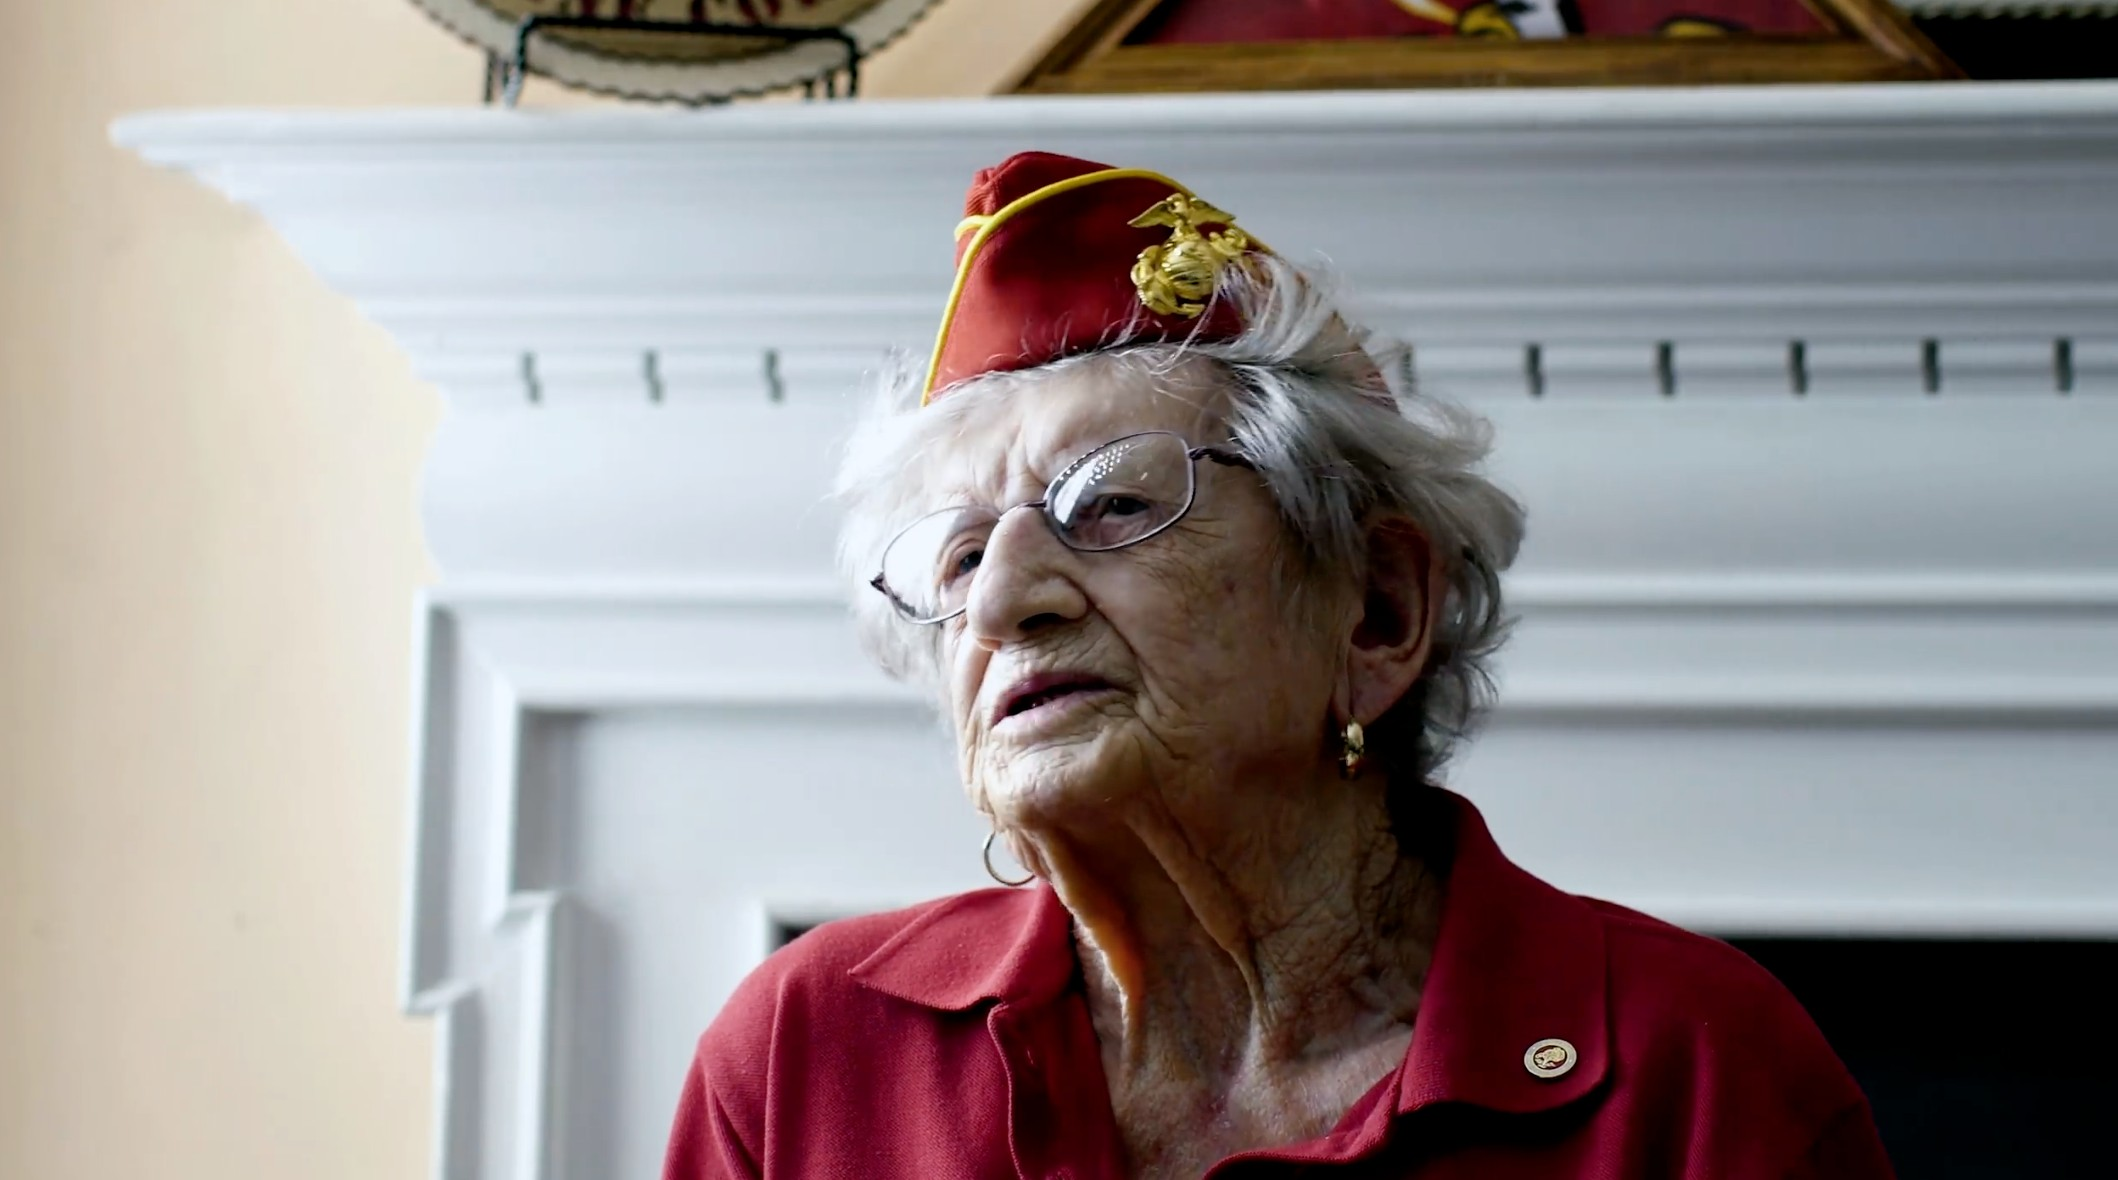 Oldest living U.S. Marine celebrates her 107th birthday